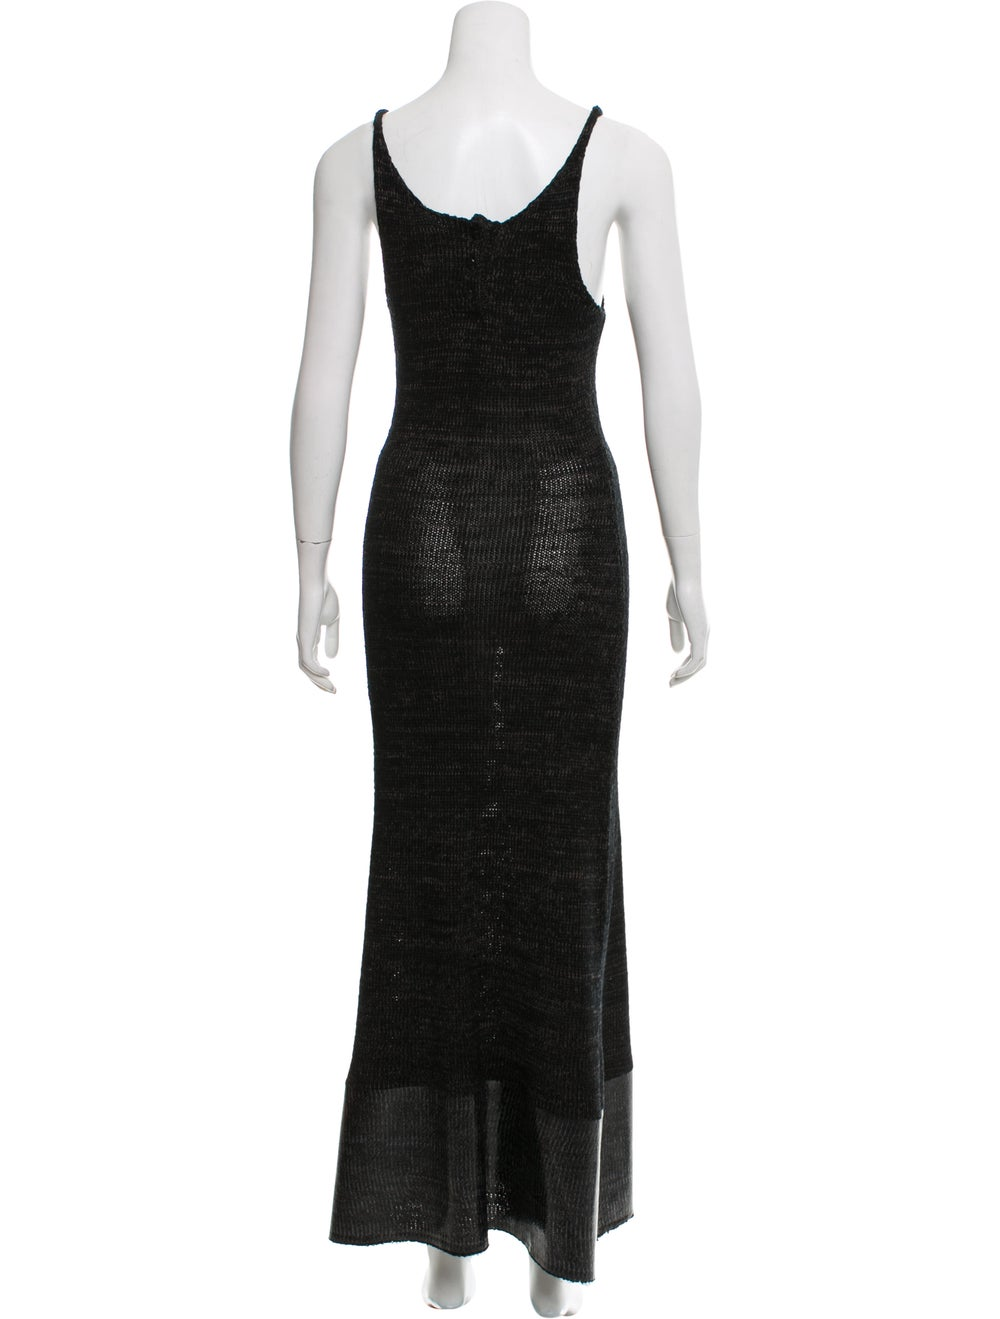 J.w. Anderson Knit Maxi Dress Black - image 3